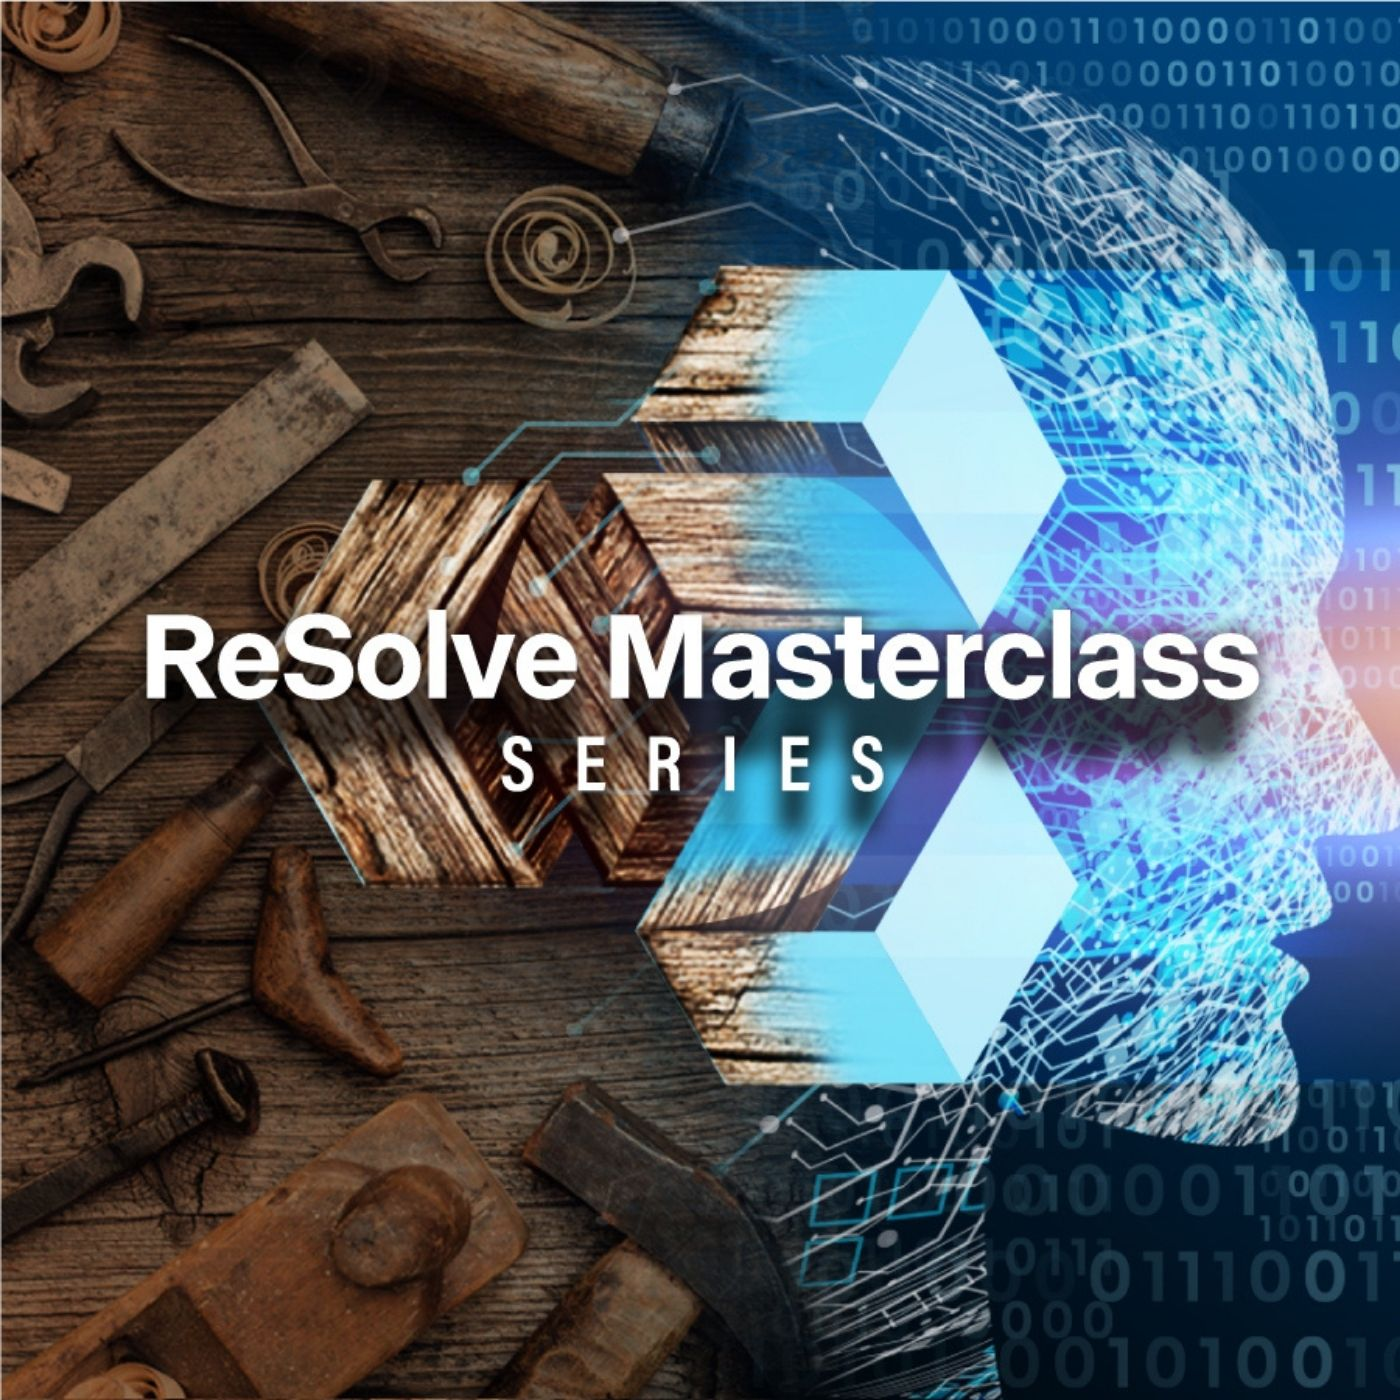 ReSolve's Masterclass